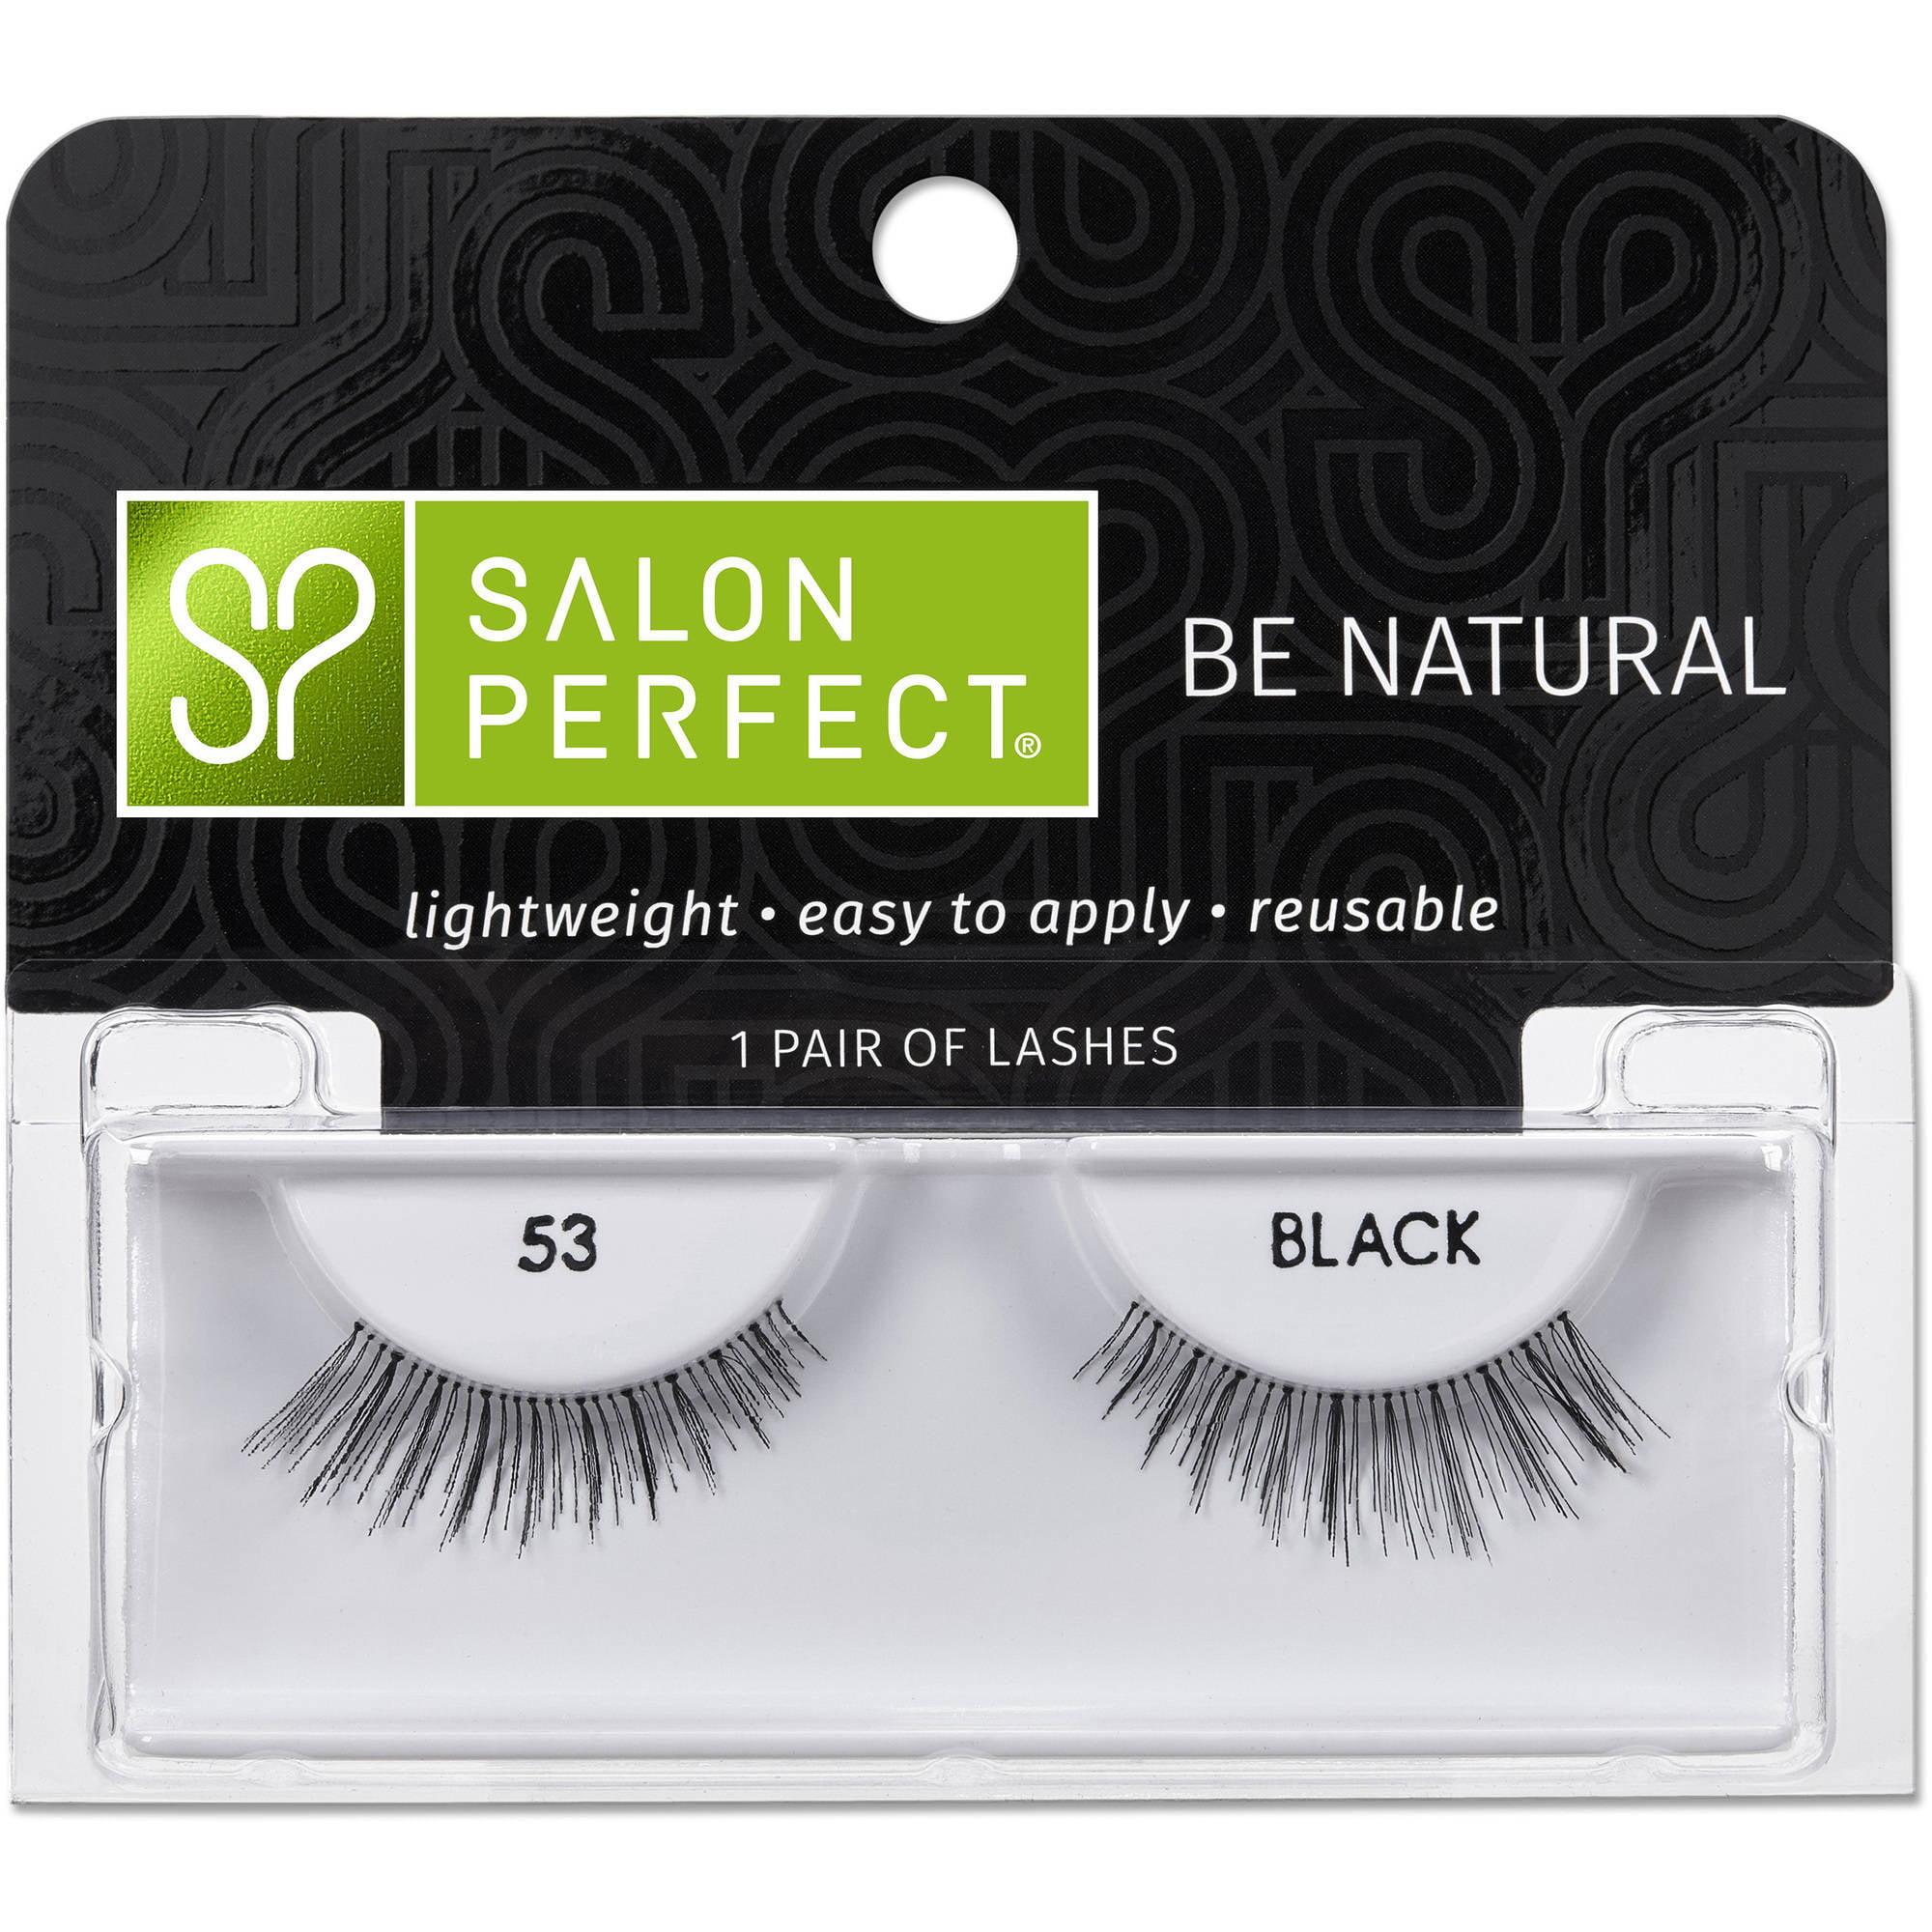 Salon Perfect Perfectly Natural Eyelashes, 53 Black, 1 pr